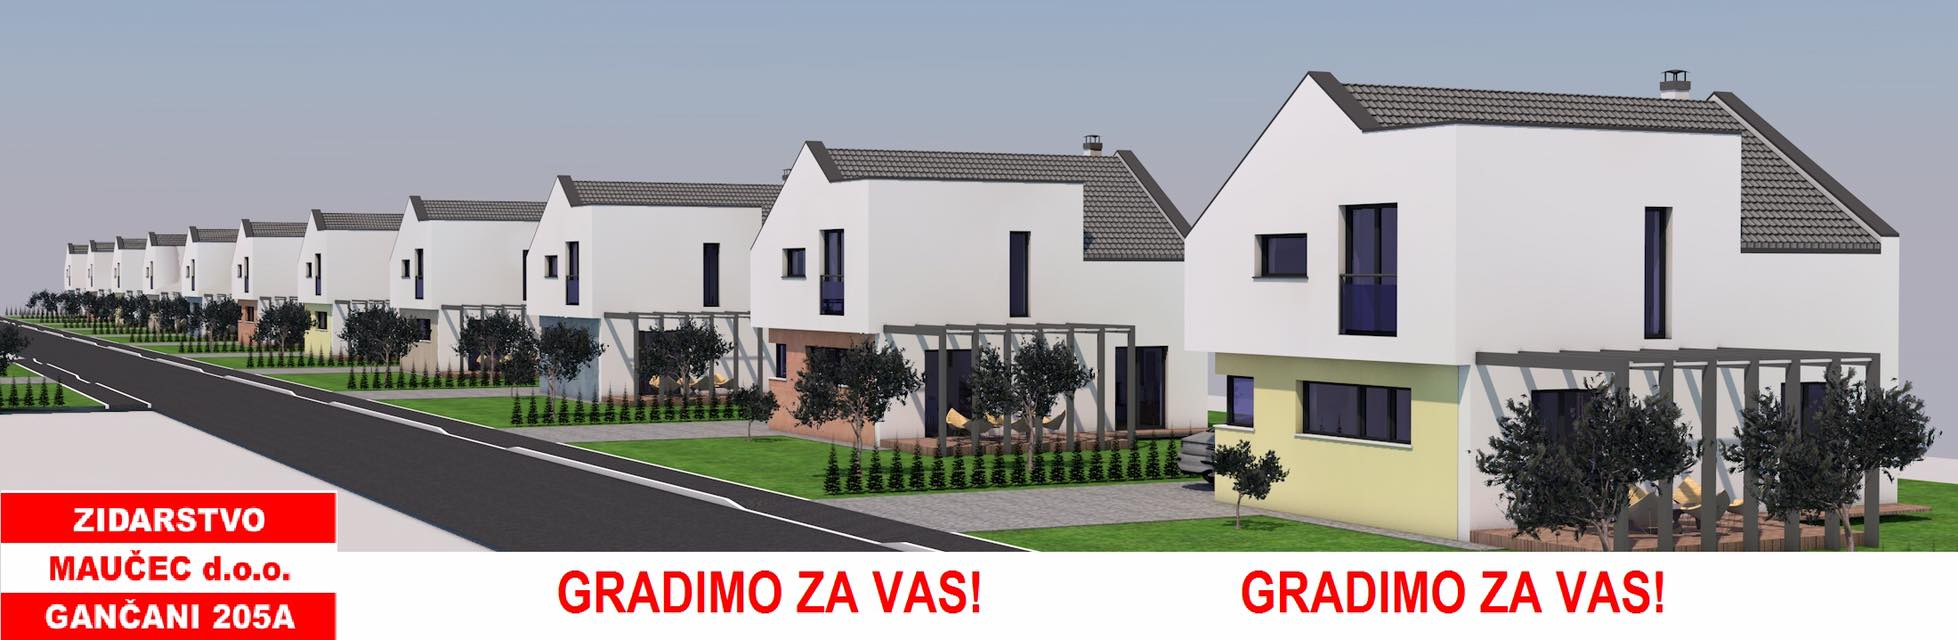 gradimo_za_vas1